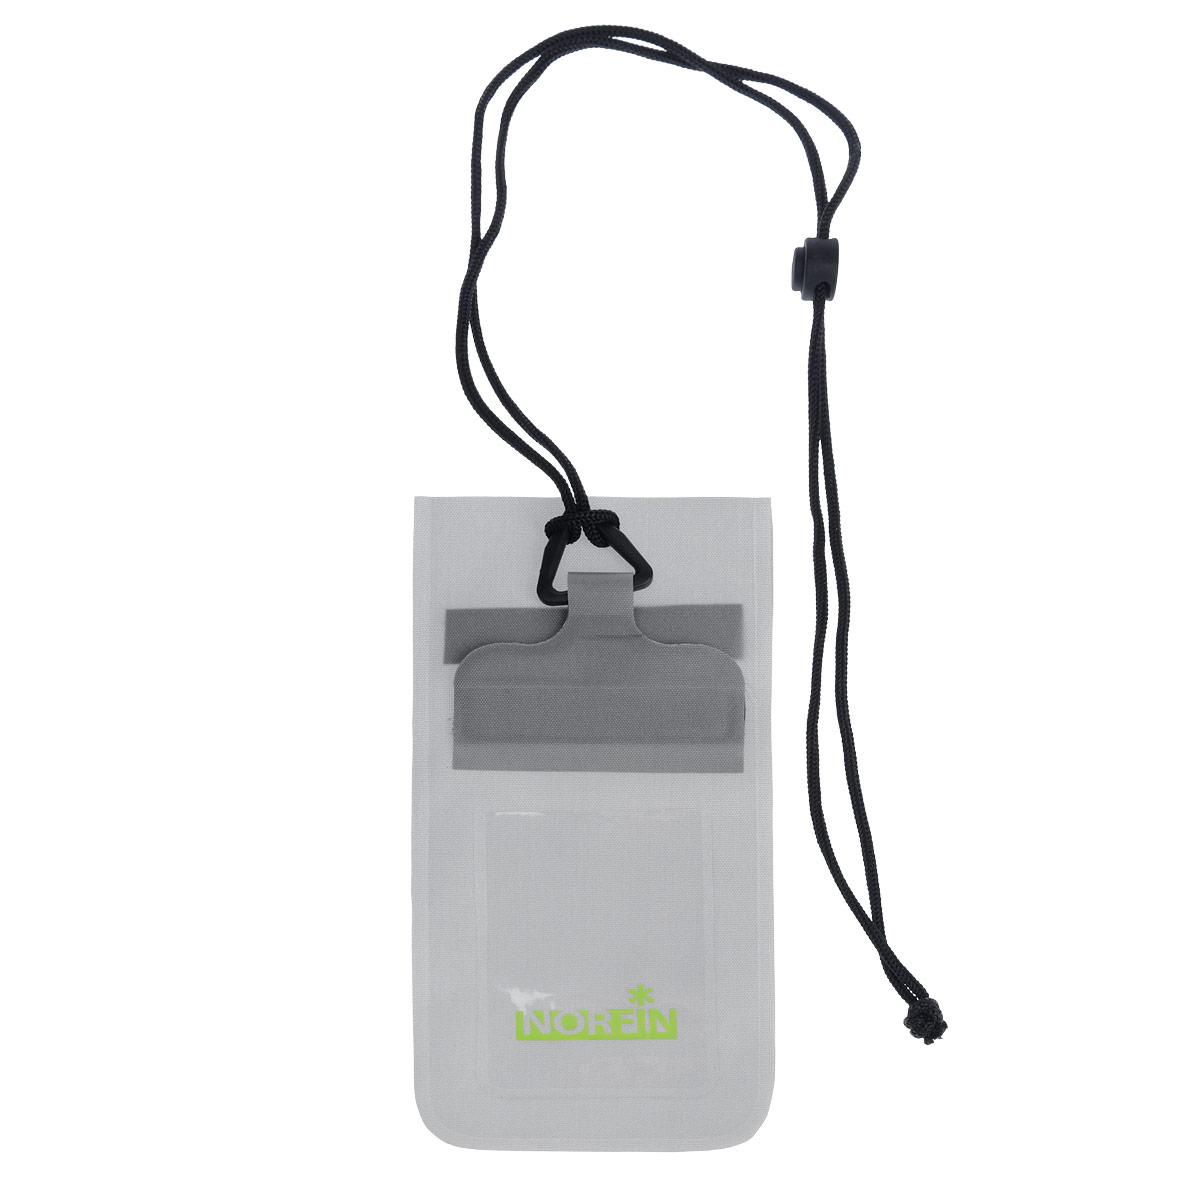 Гермочехол Norfin  Dry Case 02 , цвет: серый, 23,5 см х 11 см - Гермомешки